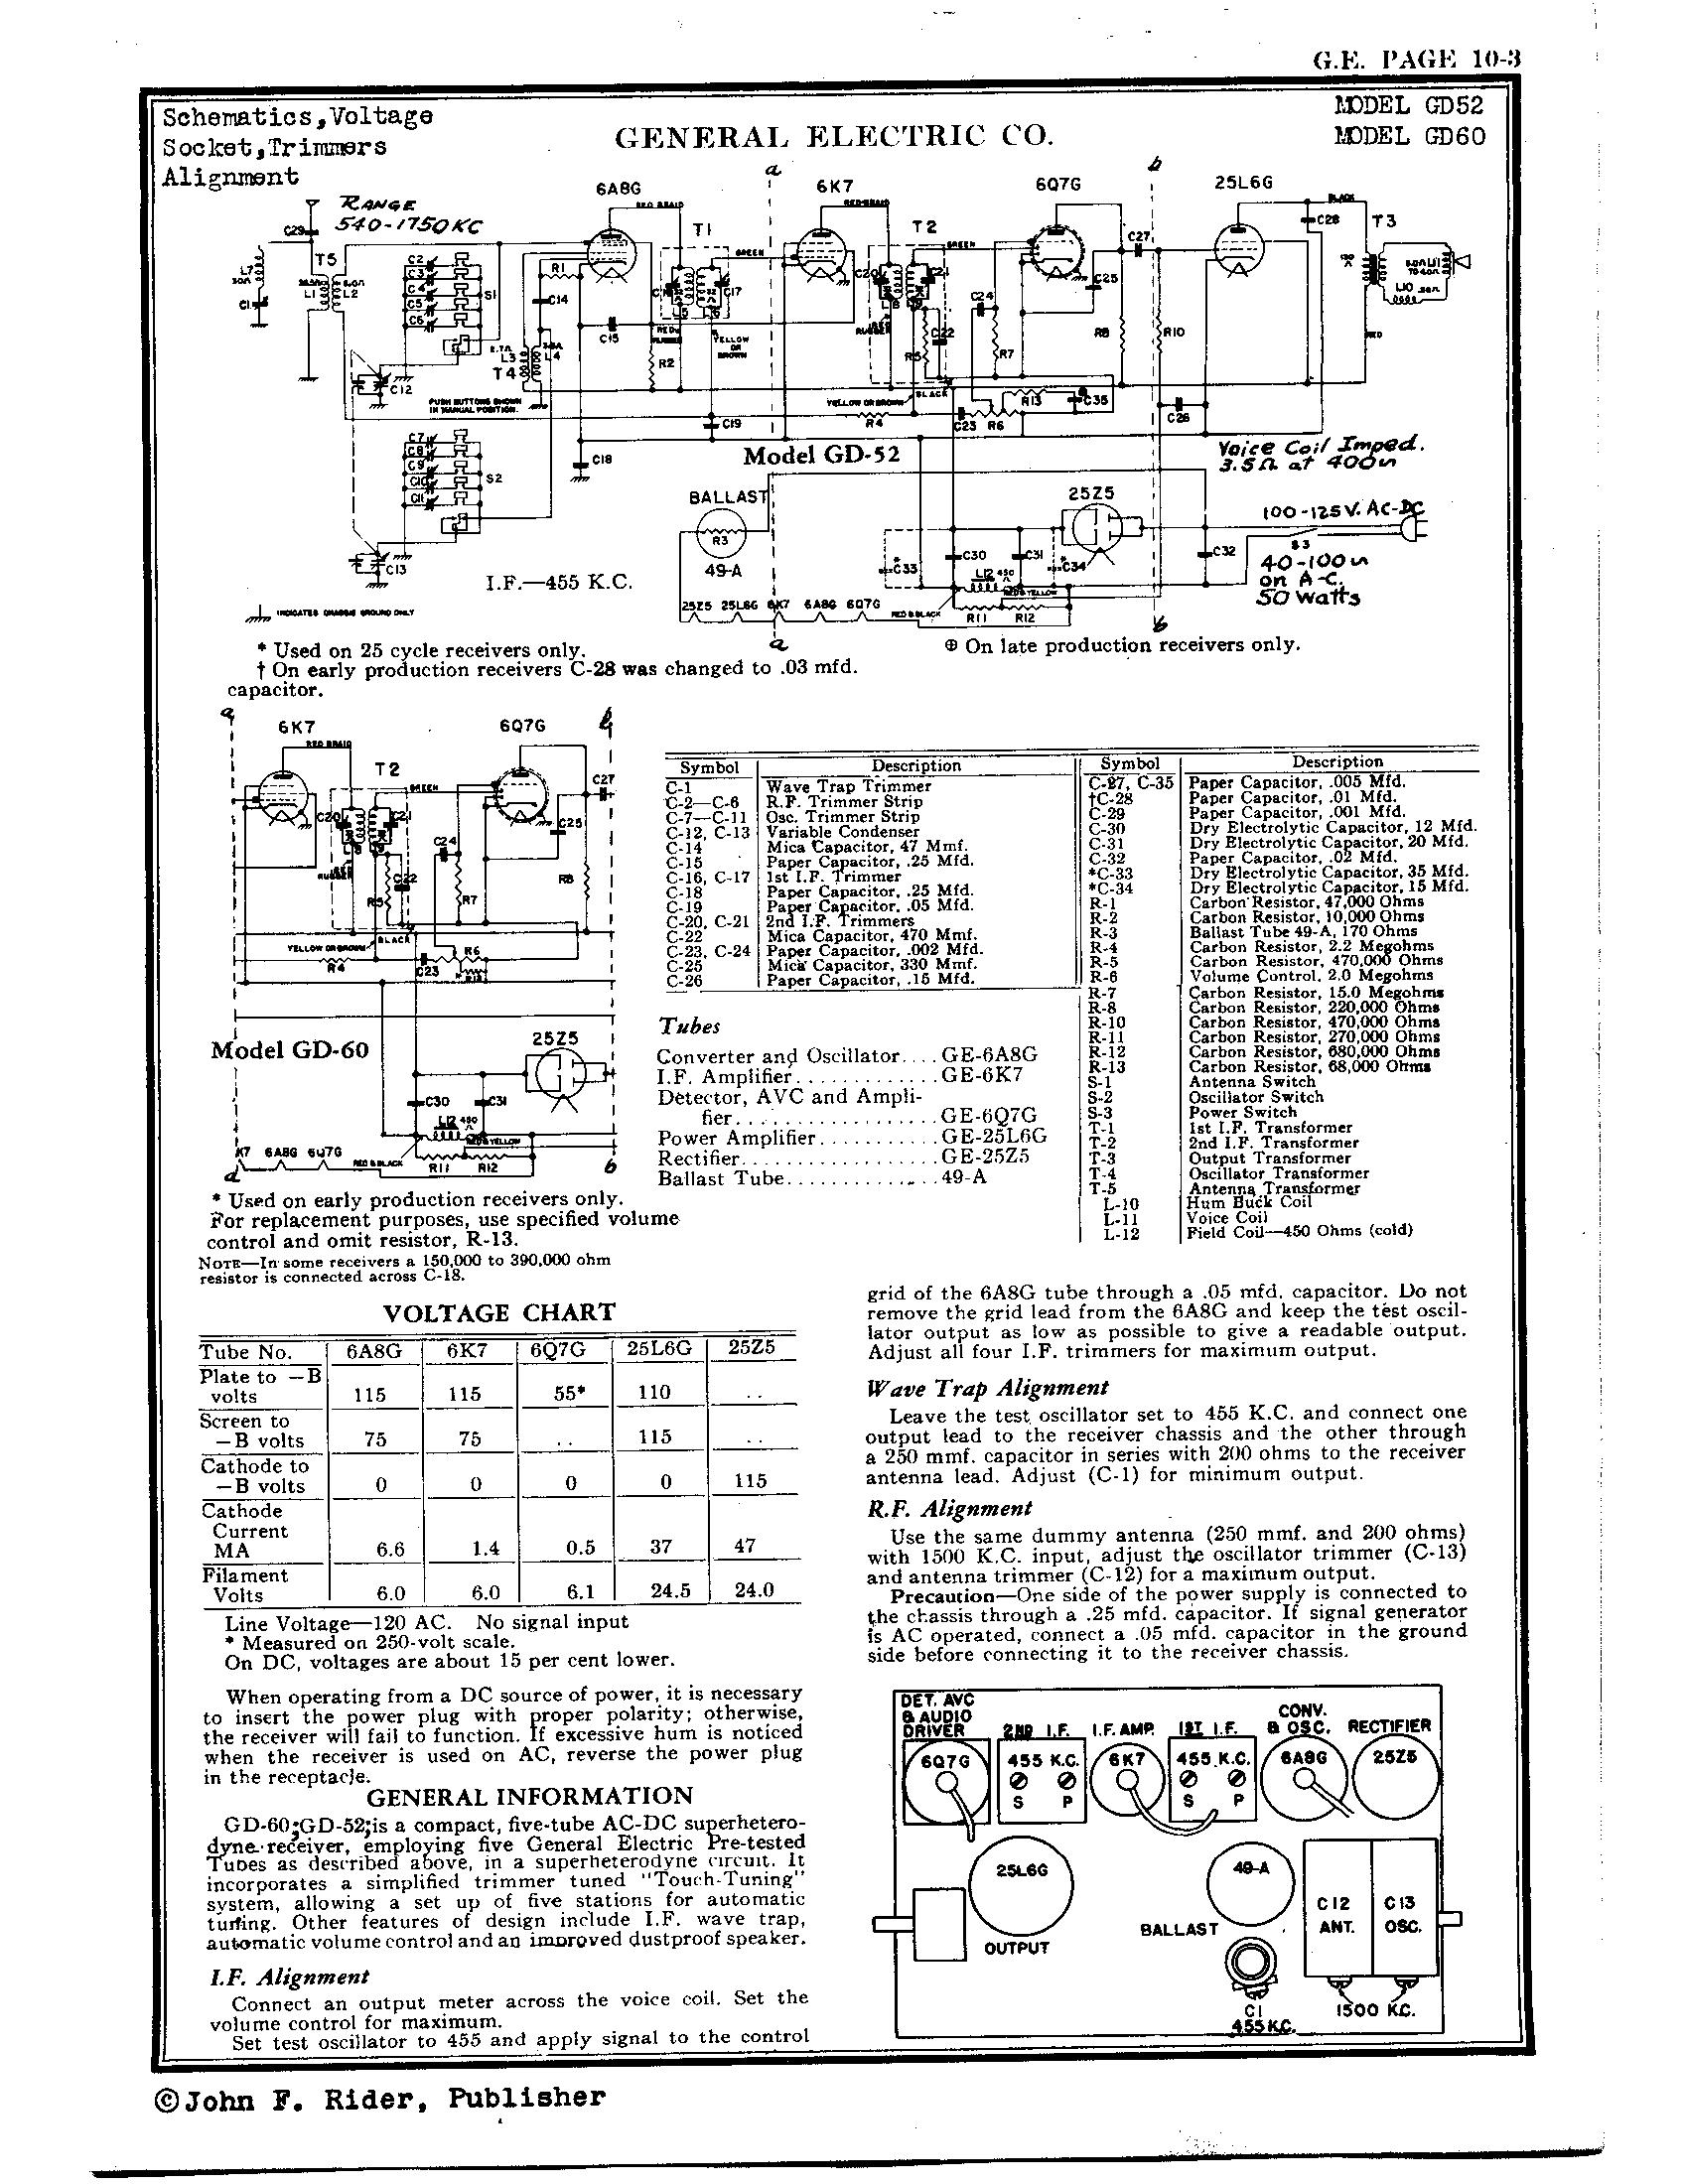 General Electric Gd60 Schematic Wire Center 1948 Ge Refrigerator Co Antique Electronic Supply Rh Tubesandmore Com Radio Schematics Diagram